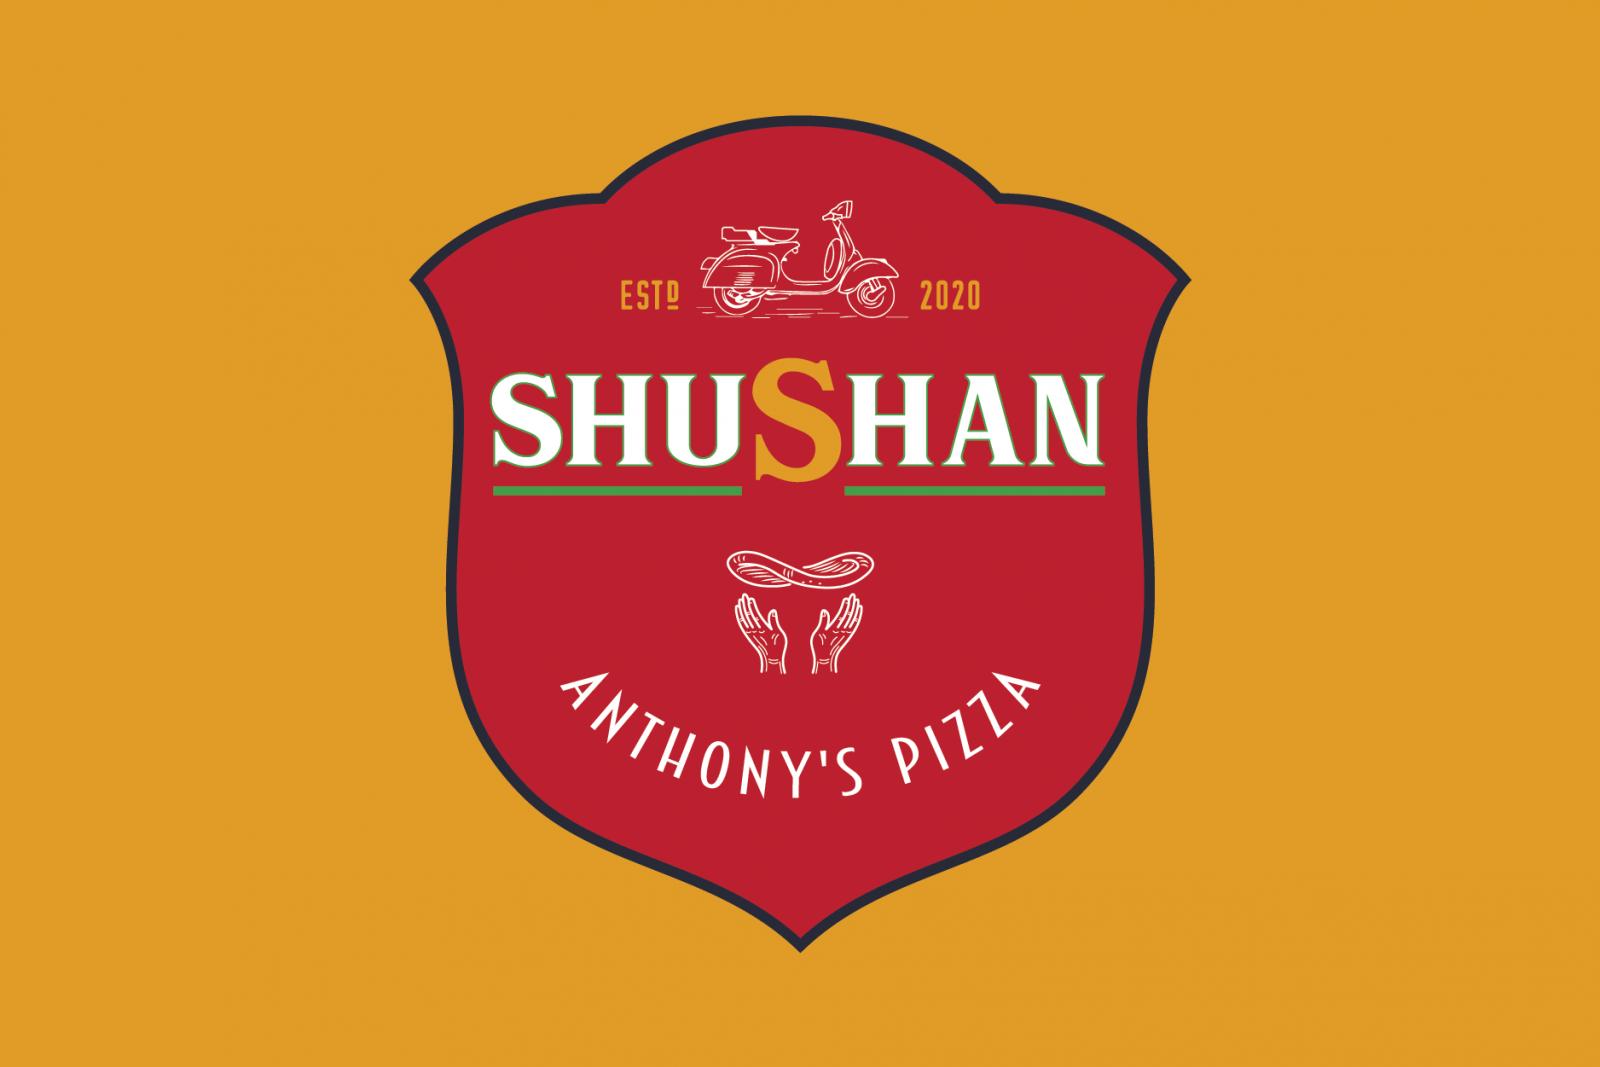 SHUSHAN red